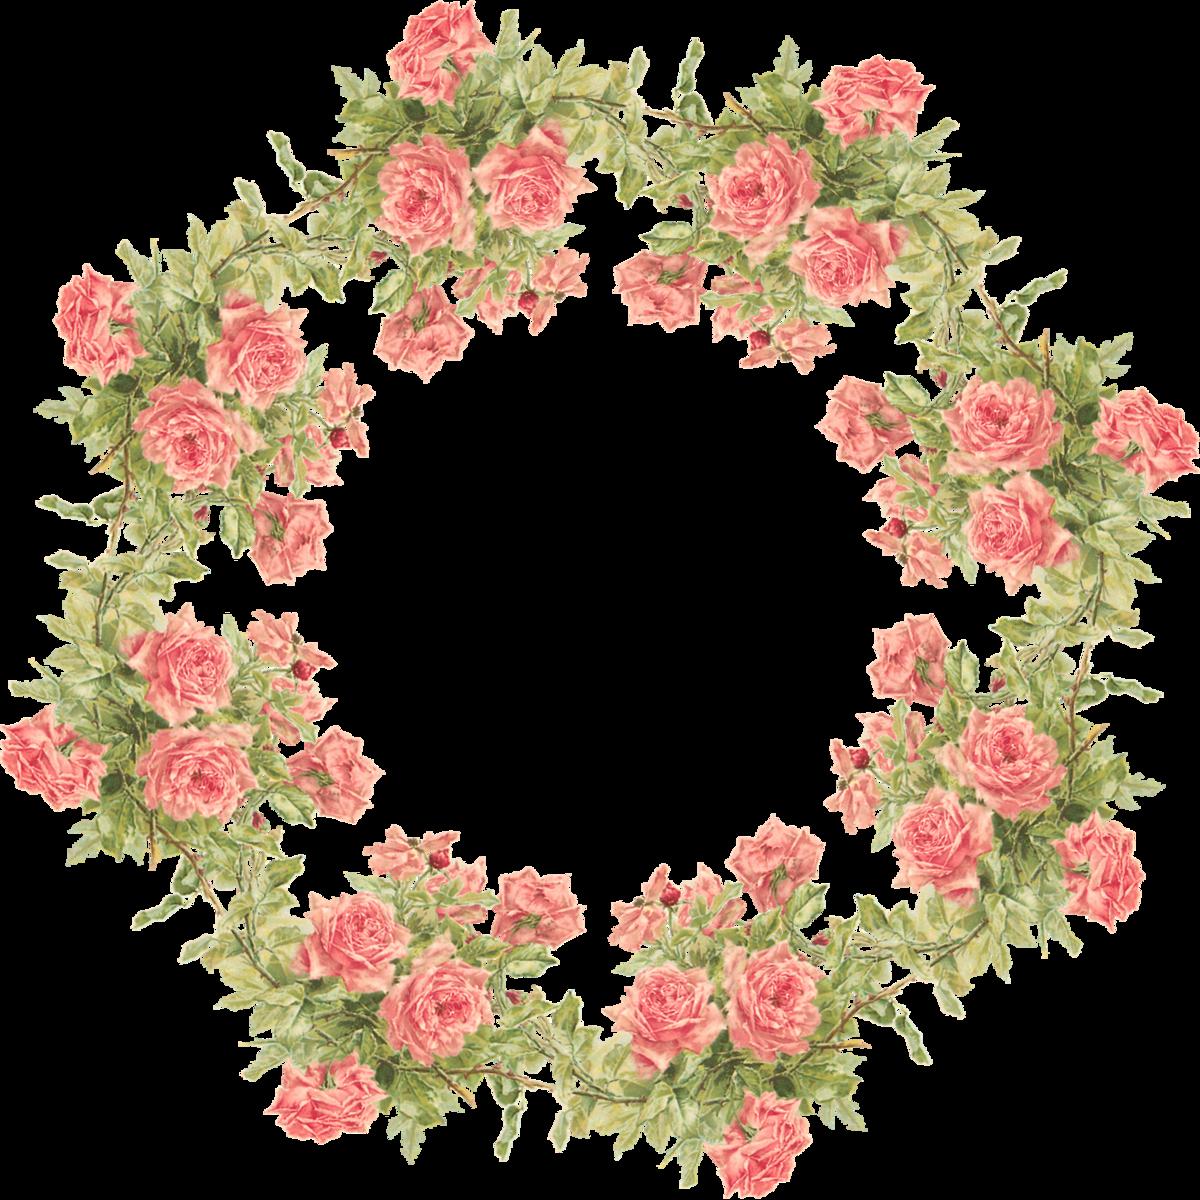 картинка цветочная круглая самый